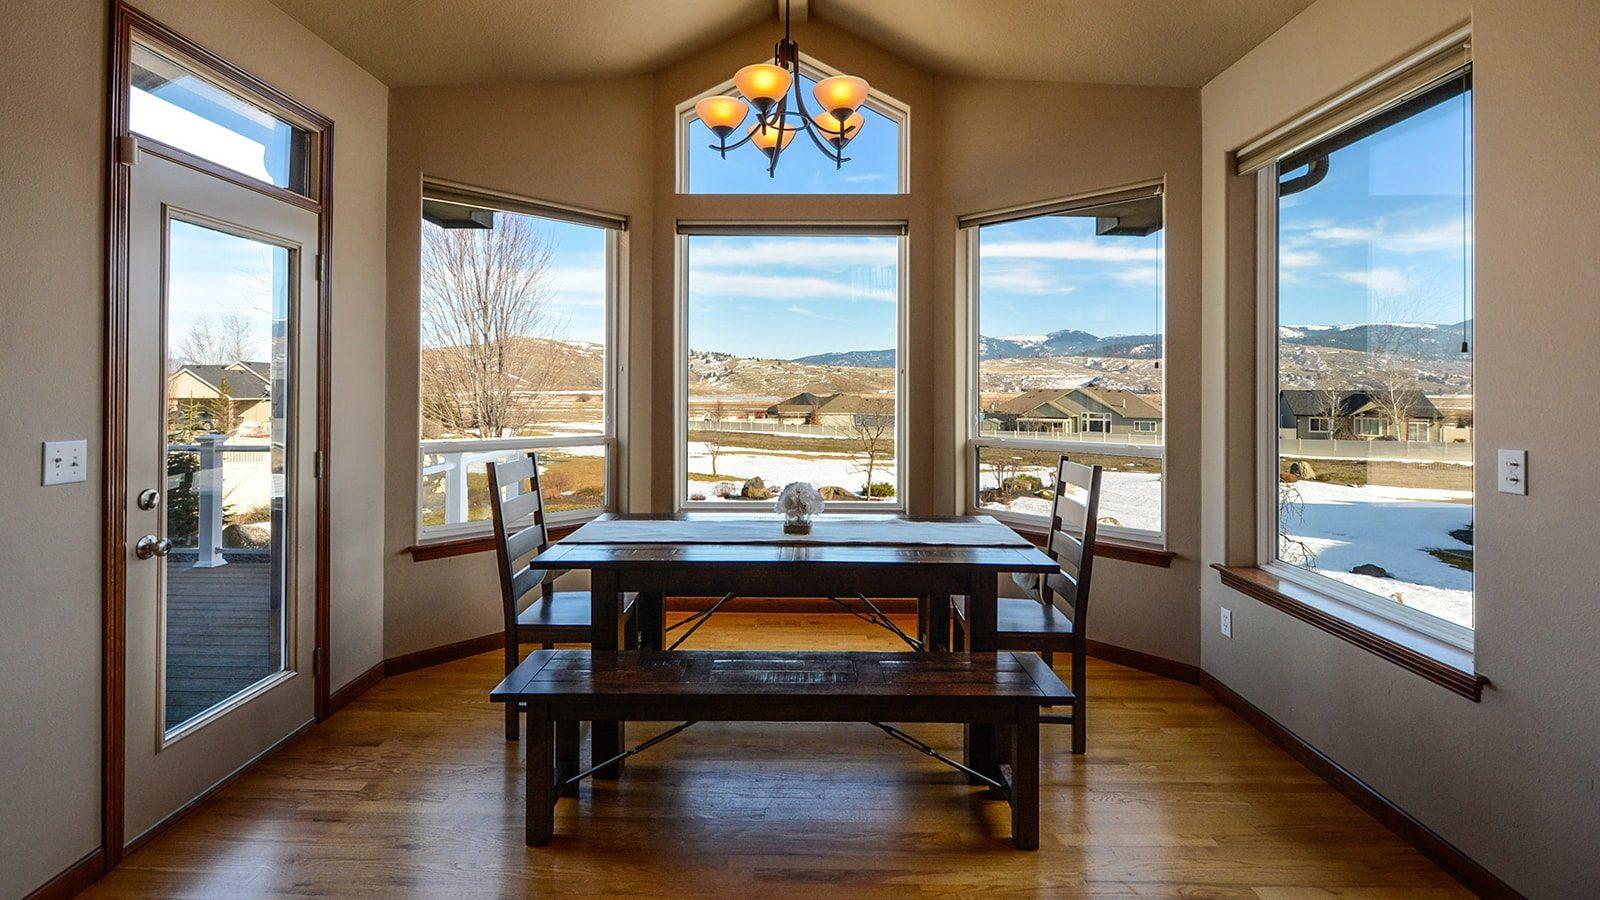 10 Chic Farmhouse Dining Room Design Ideas